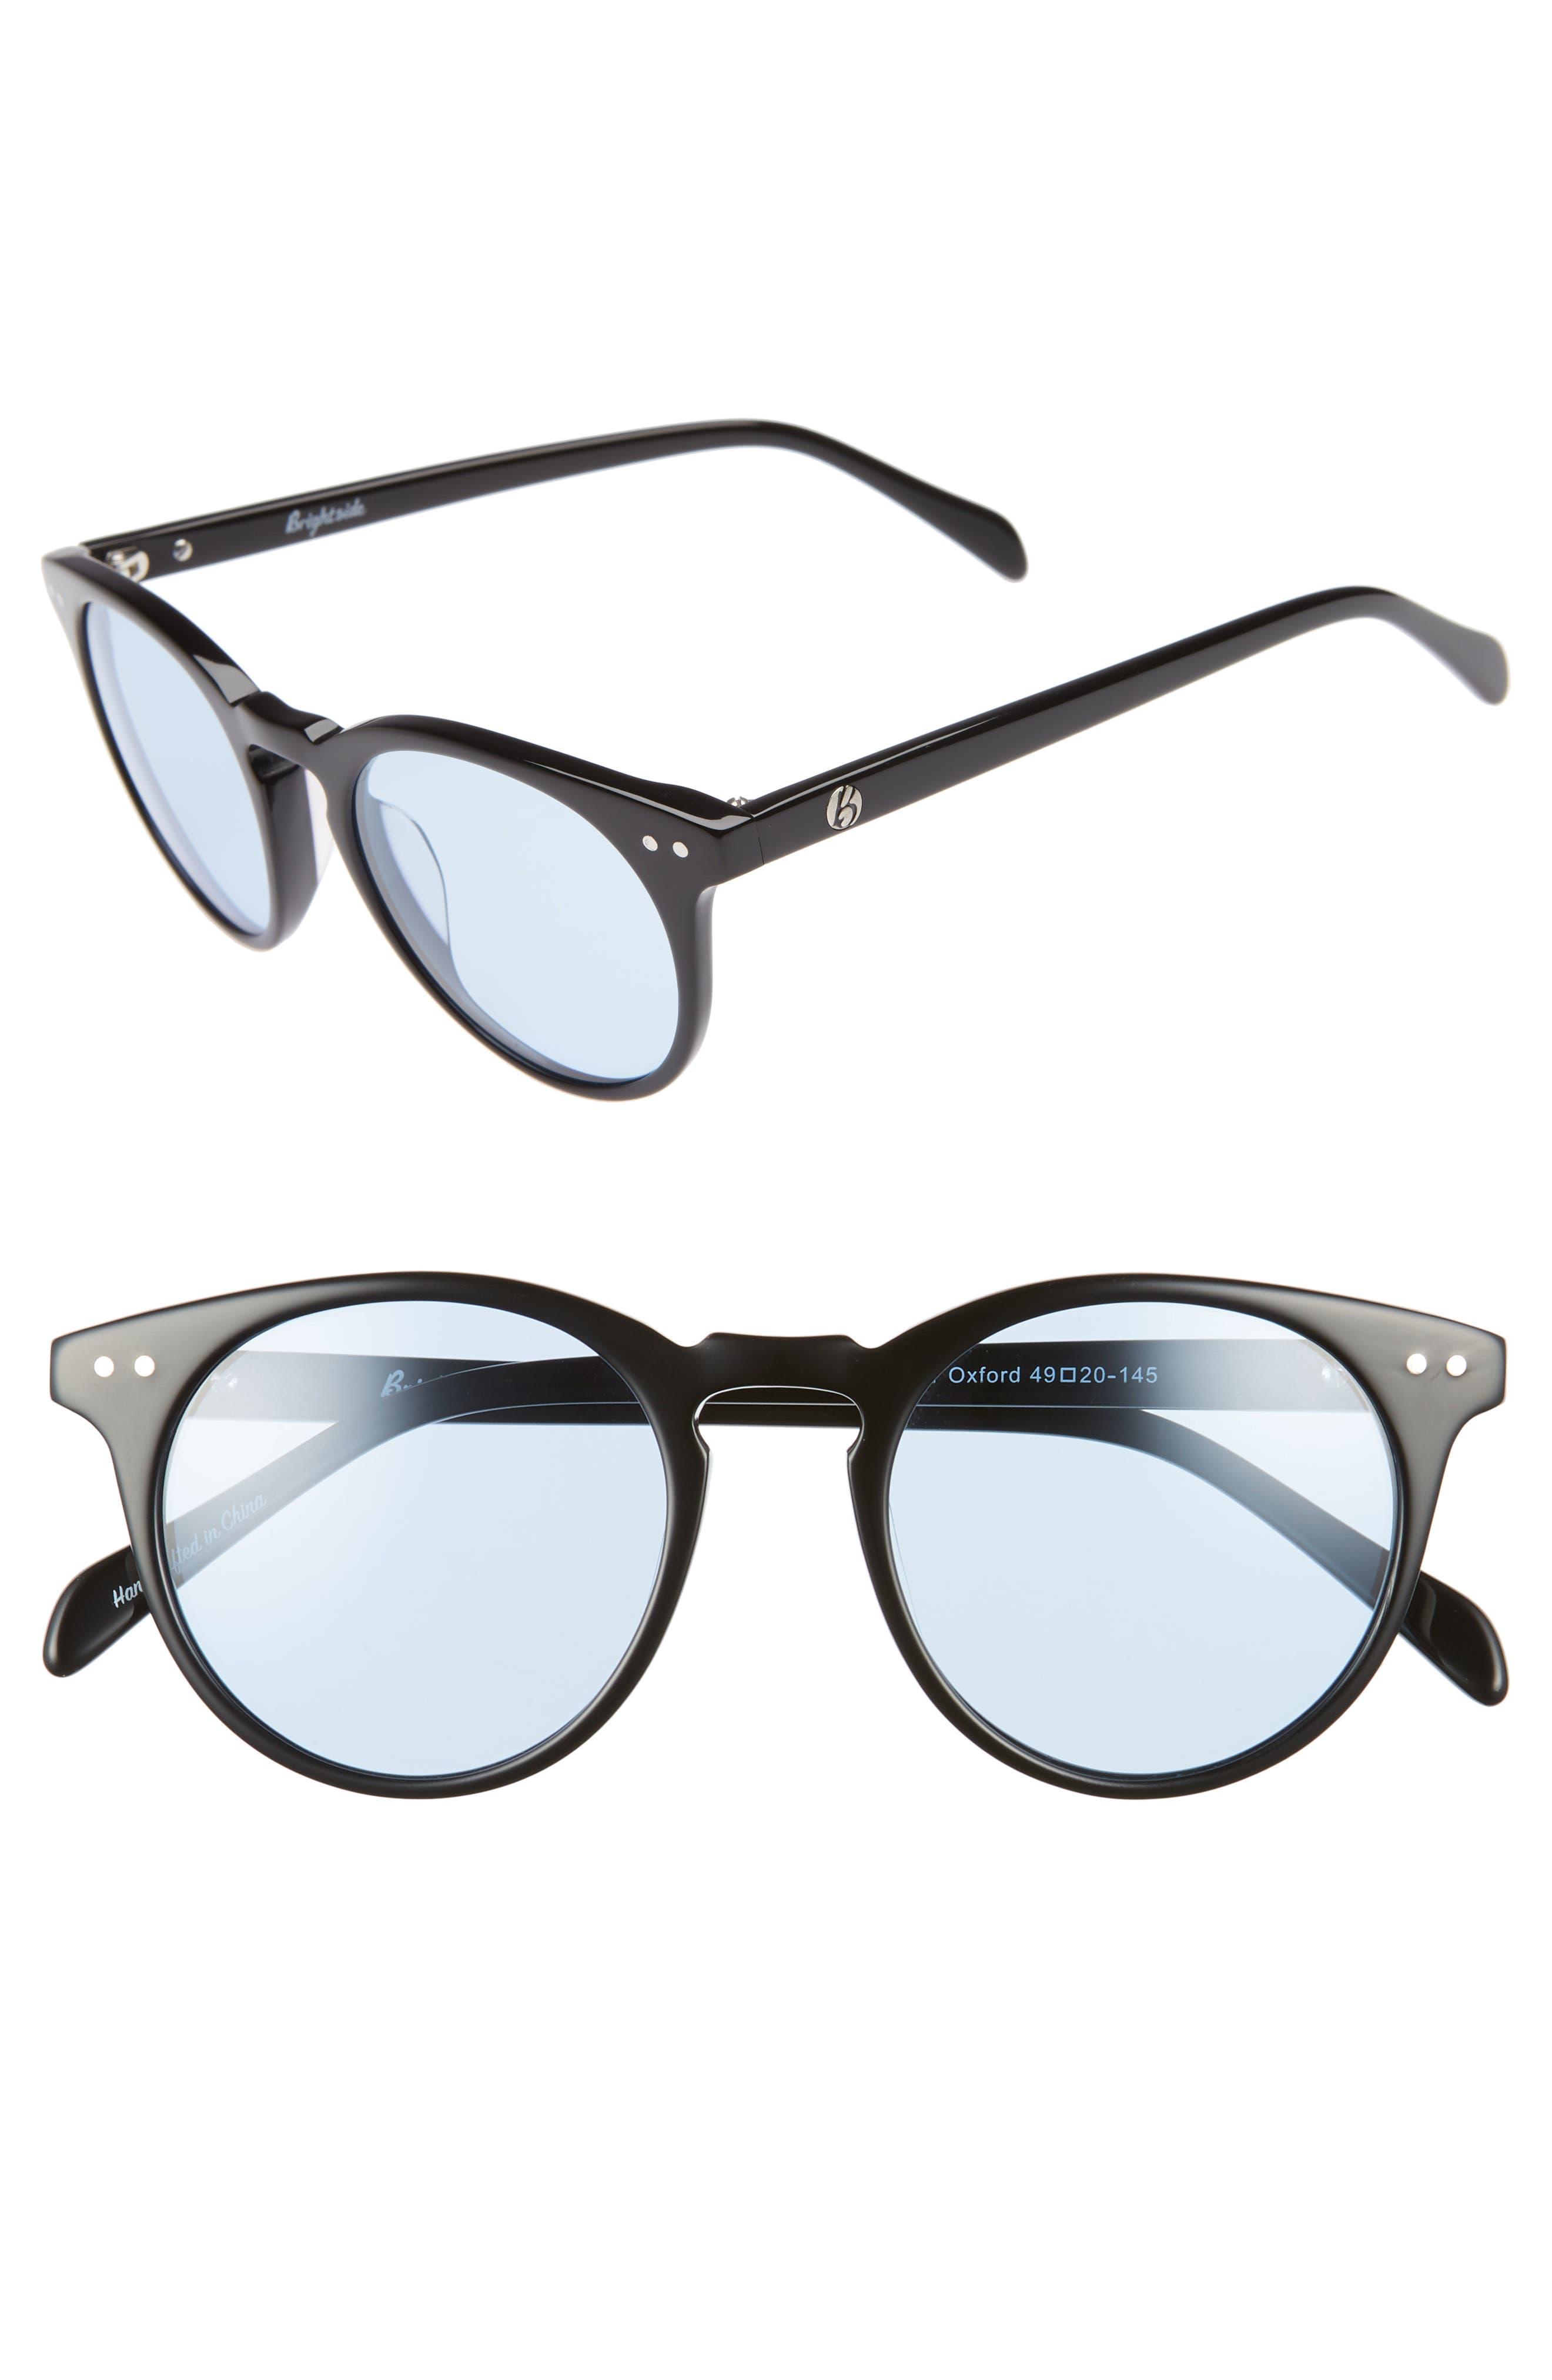 Oxford 49mm Sunglasses,                             Main thumbnail 1, color,                             BLACK/ ARCTIC BLUE